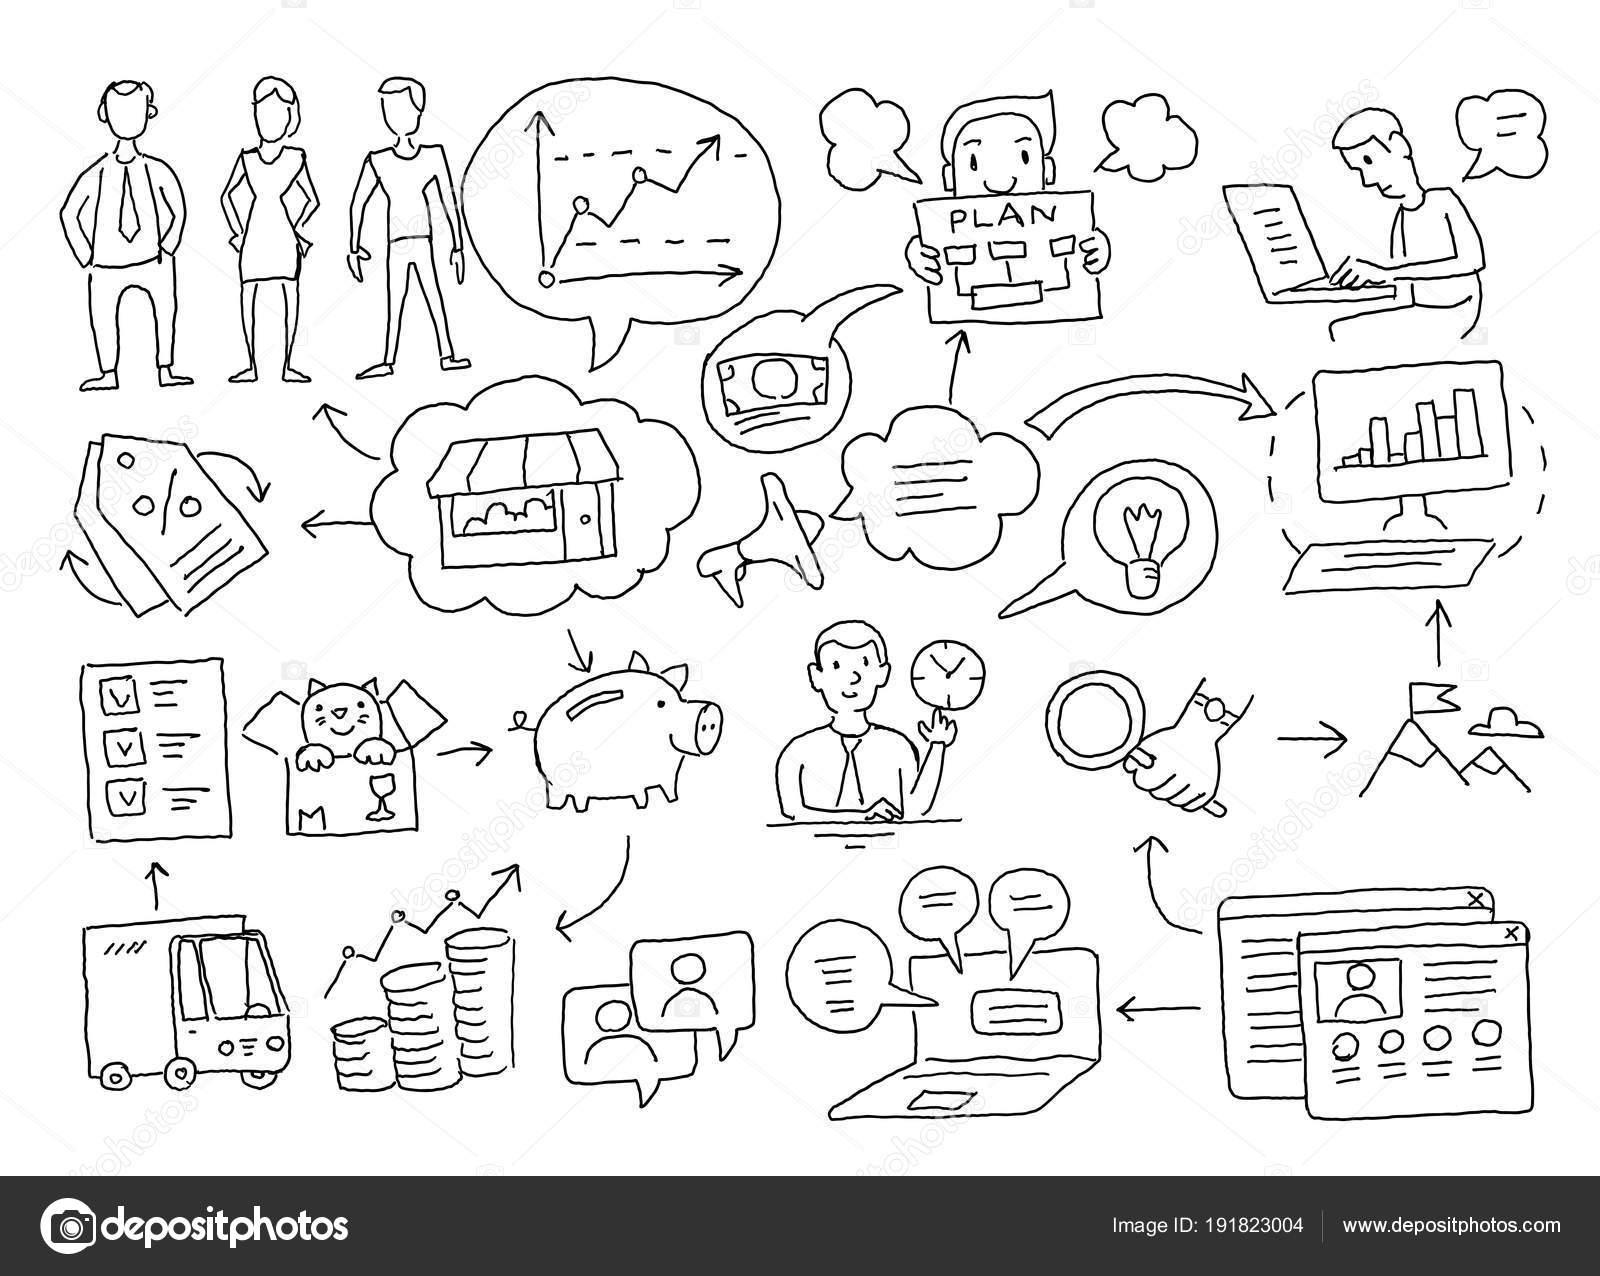 sketch diagram of cases  business plan presentation